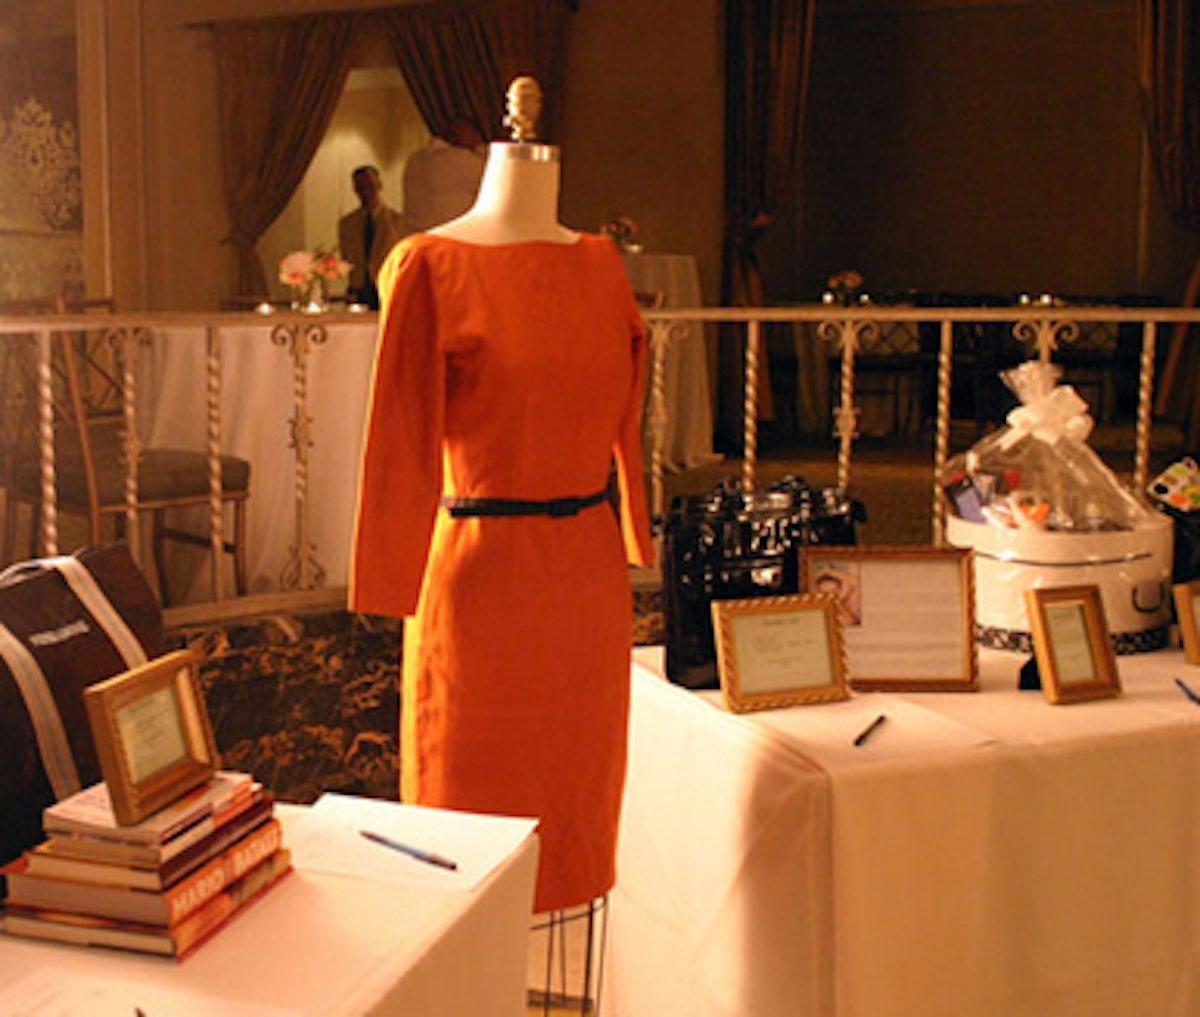 blog_gossip_girl_dress-thumb-386x327.jpg